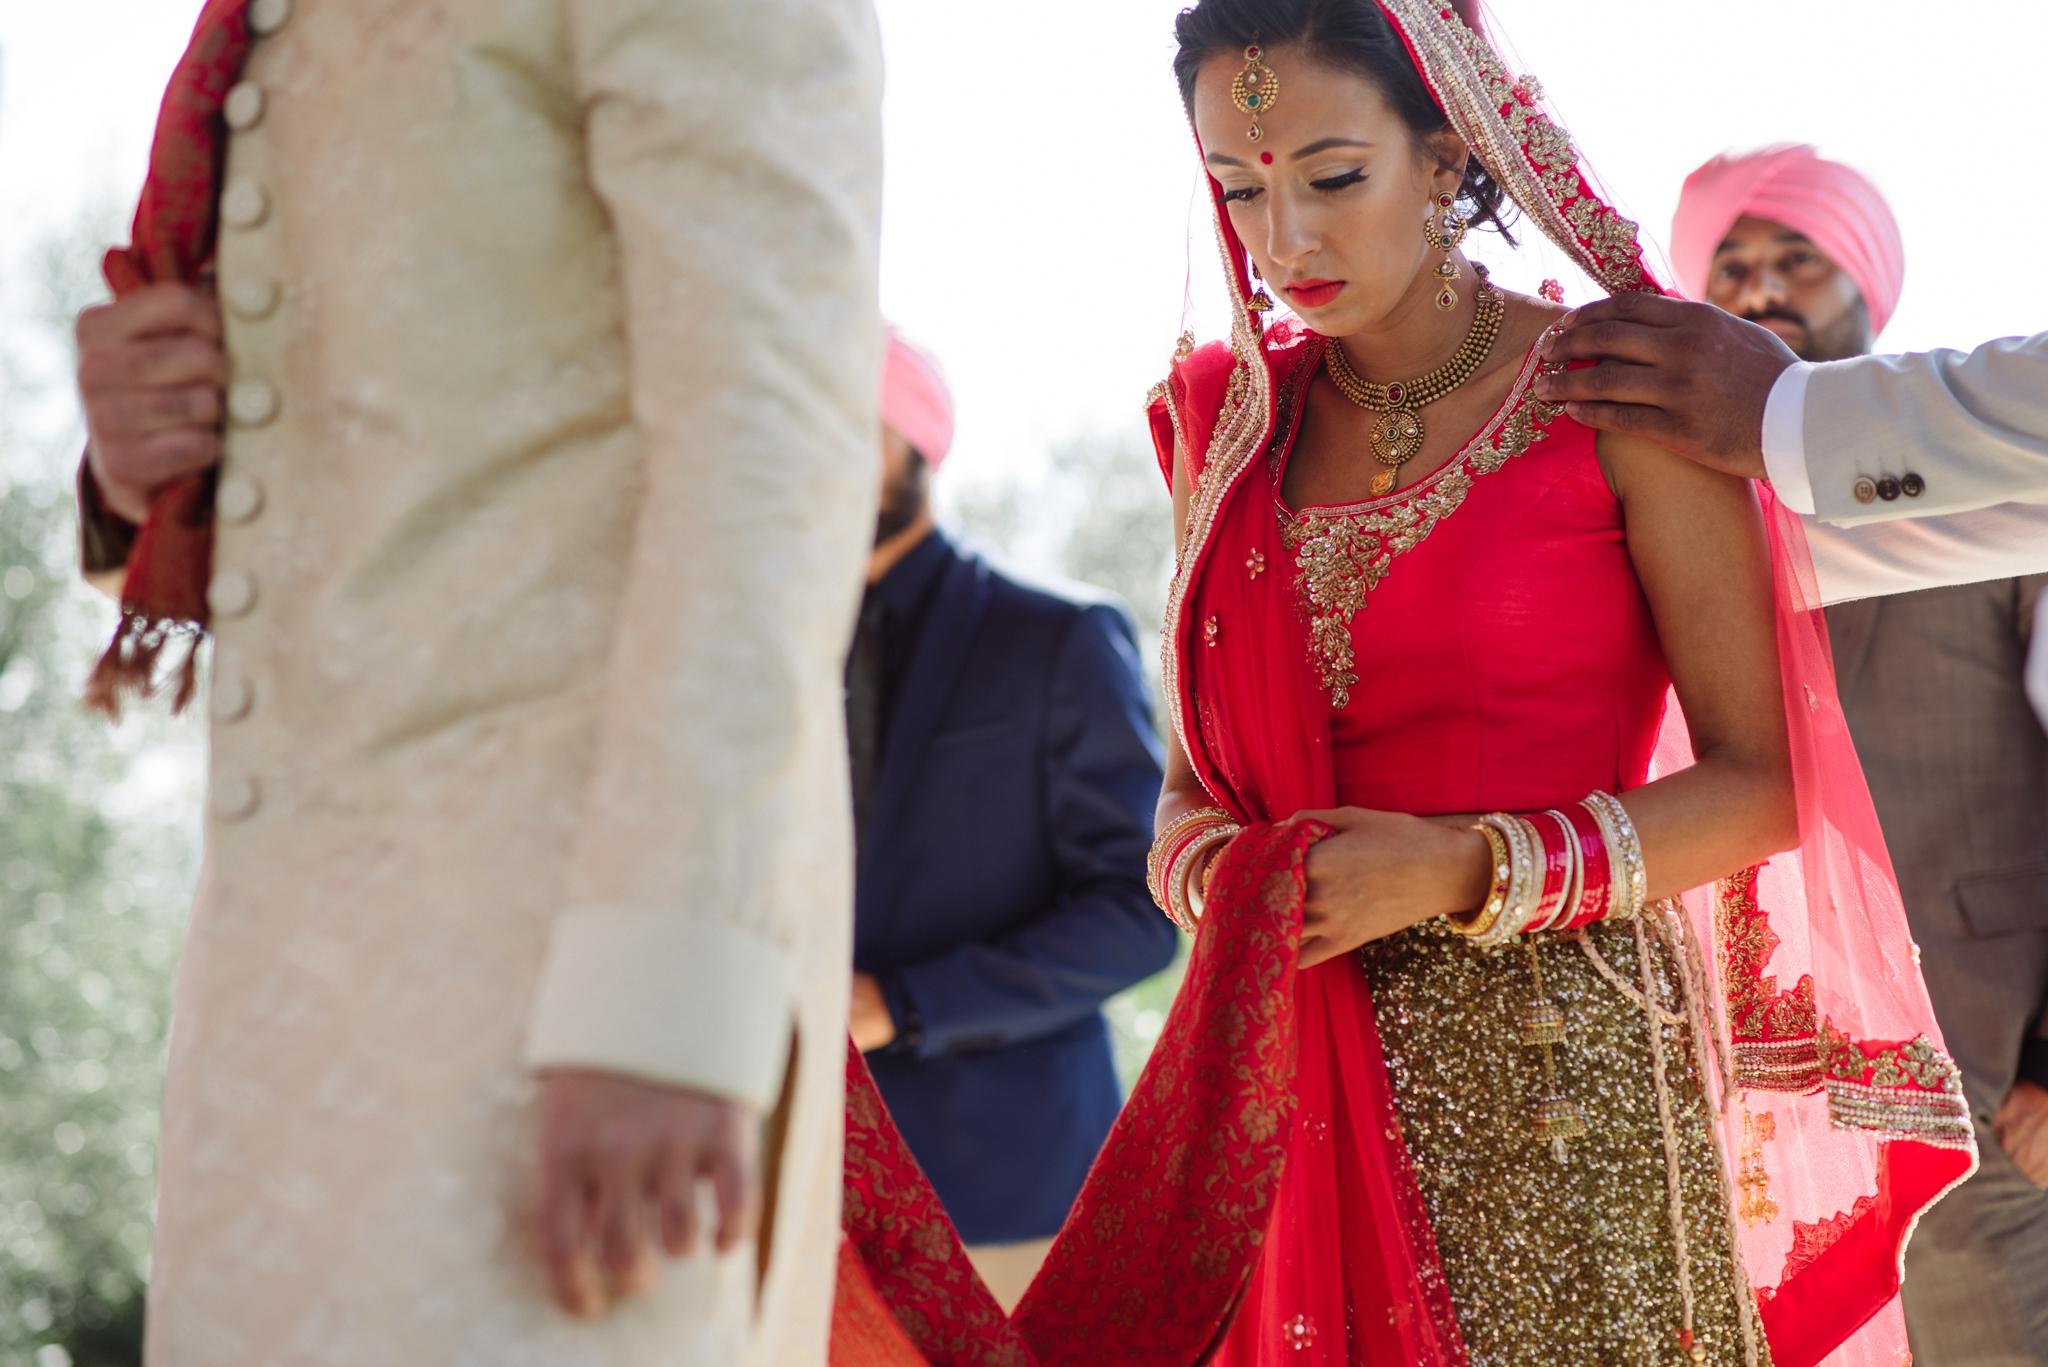 elisabetta-marzetti-indian-wedding-italy_0042.jpg